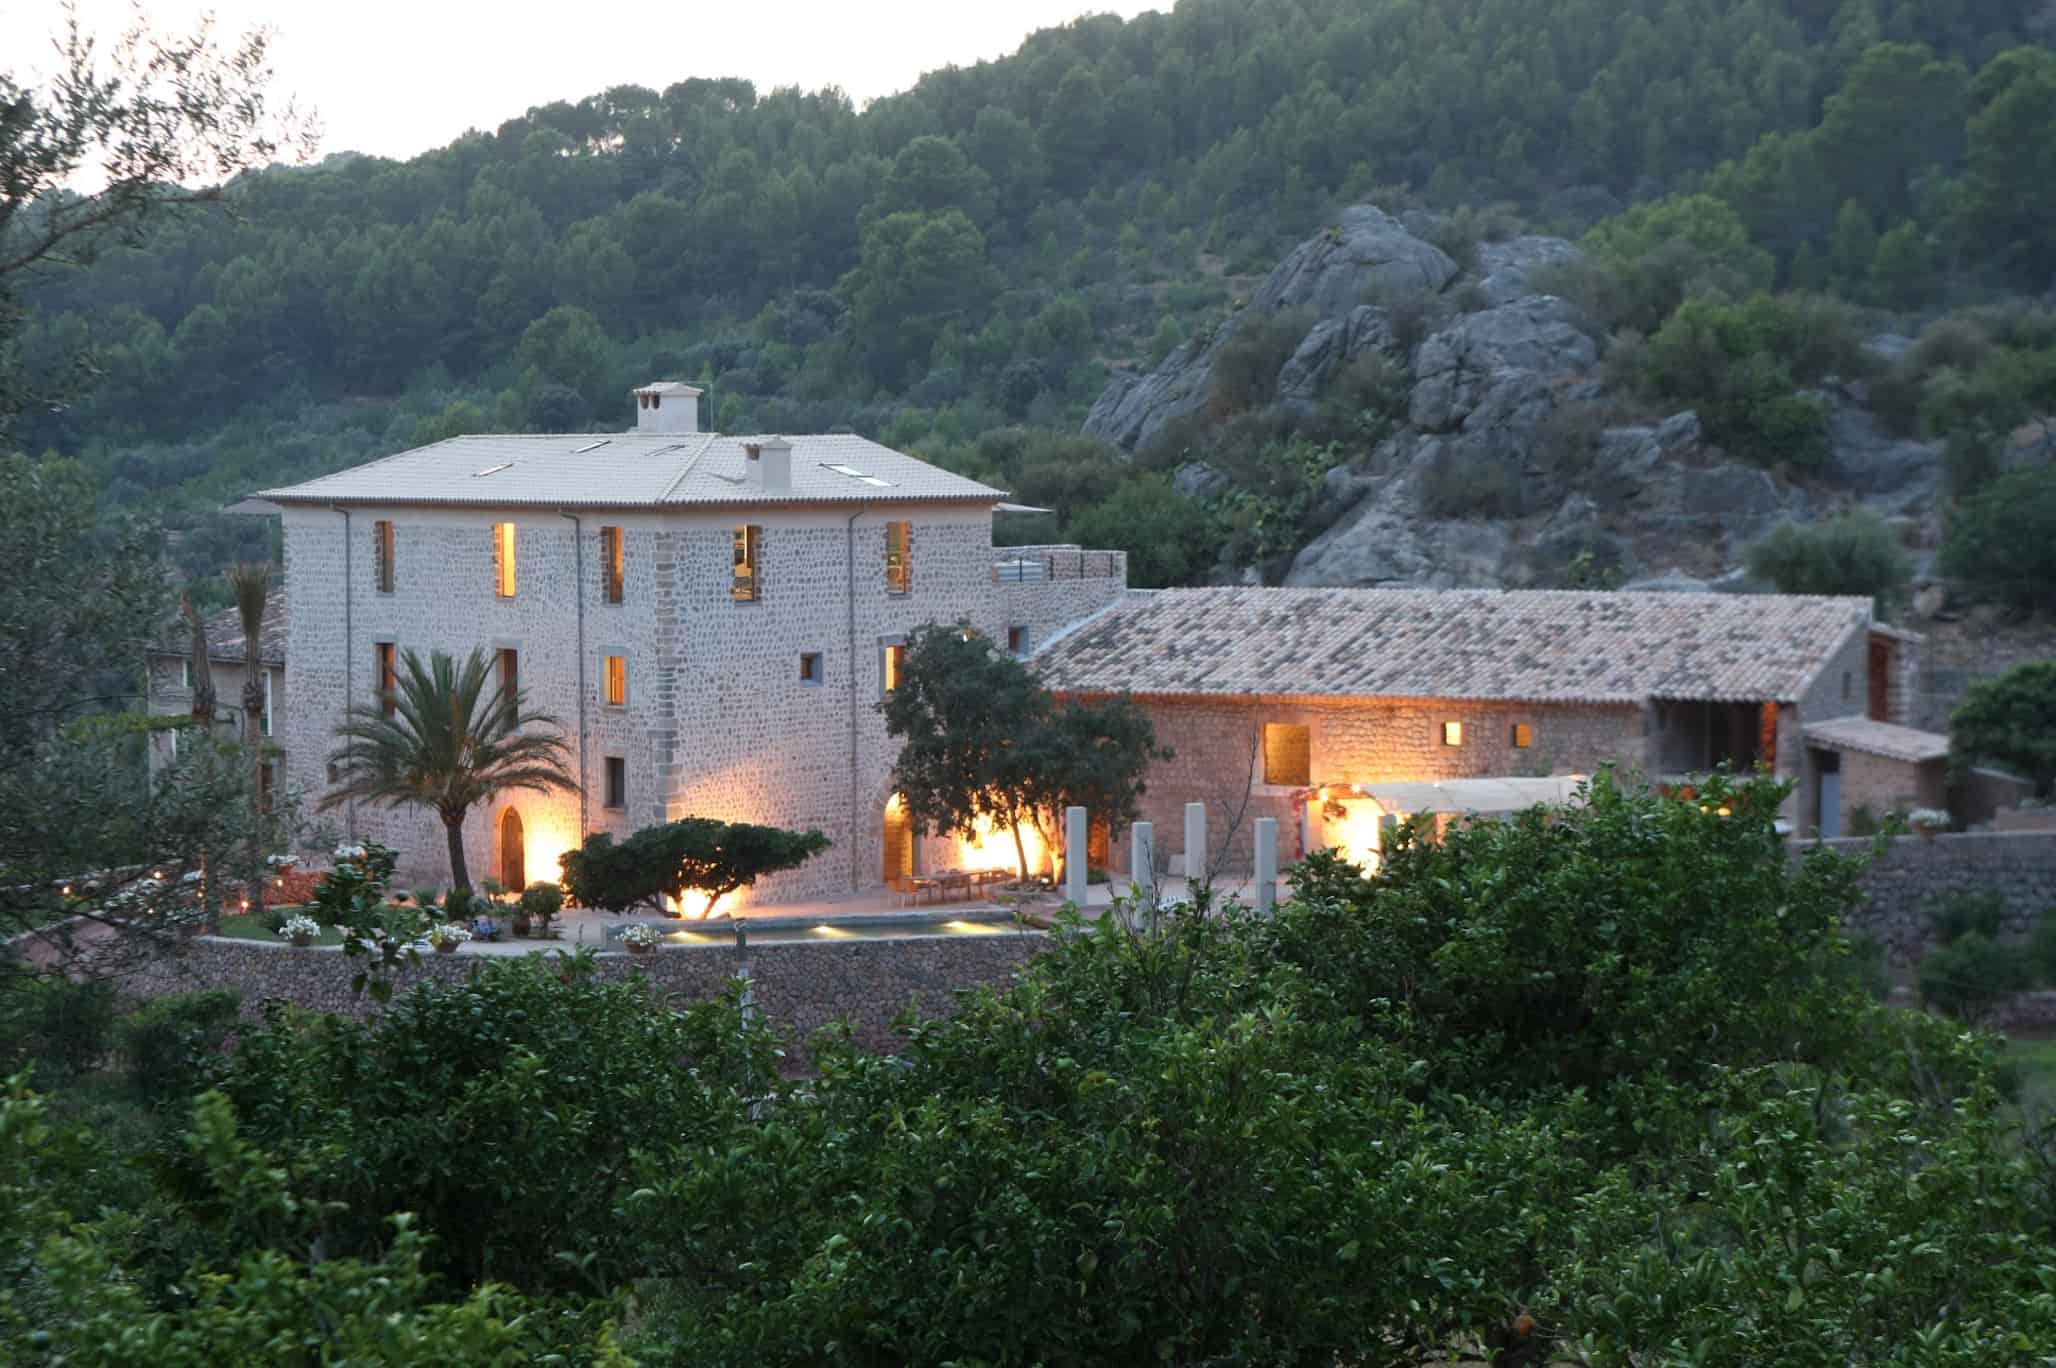 Rental Mallorca - 6 Bedrooms - Balearic Bliss - Casa Hidalgo - outside lighting